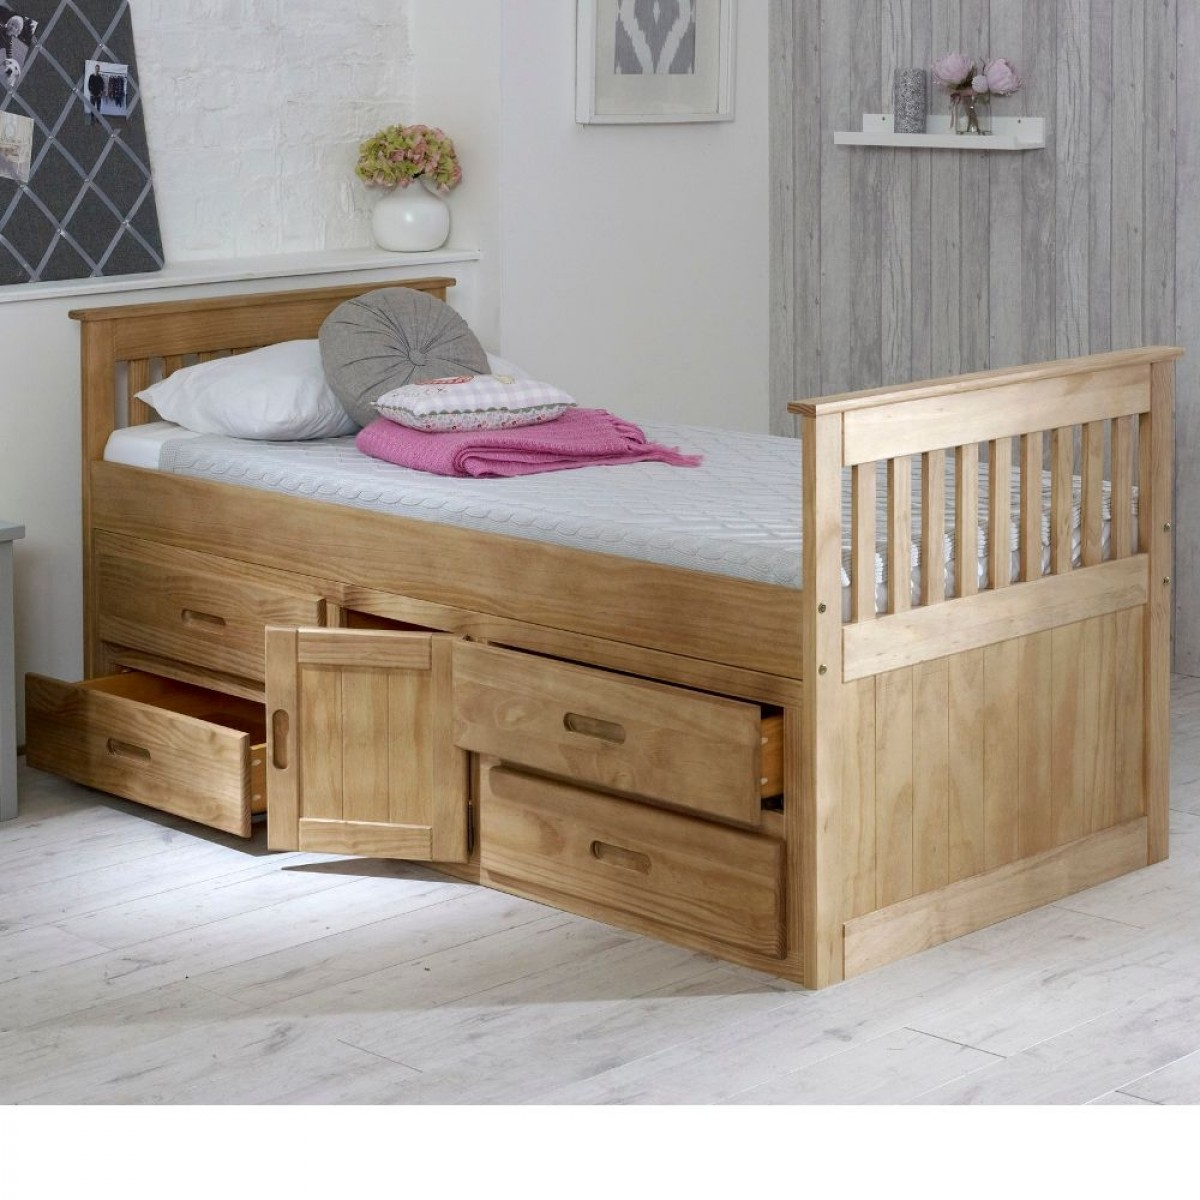 captains waxed pine wooden storage bed. Black Bedroom Furniture Sets. Home Design Ideas